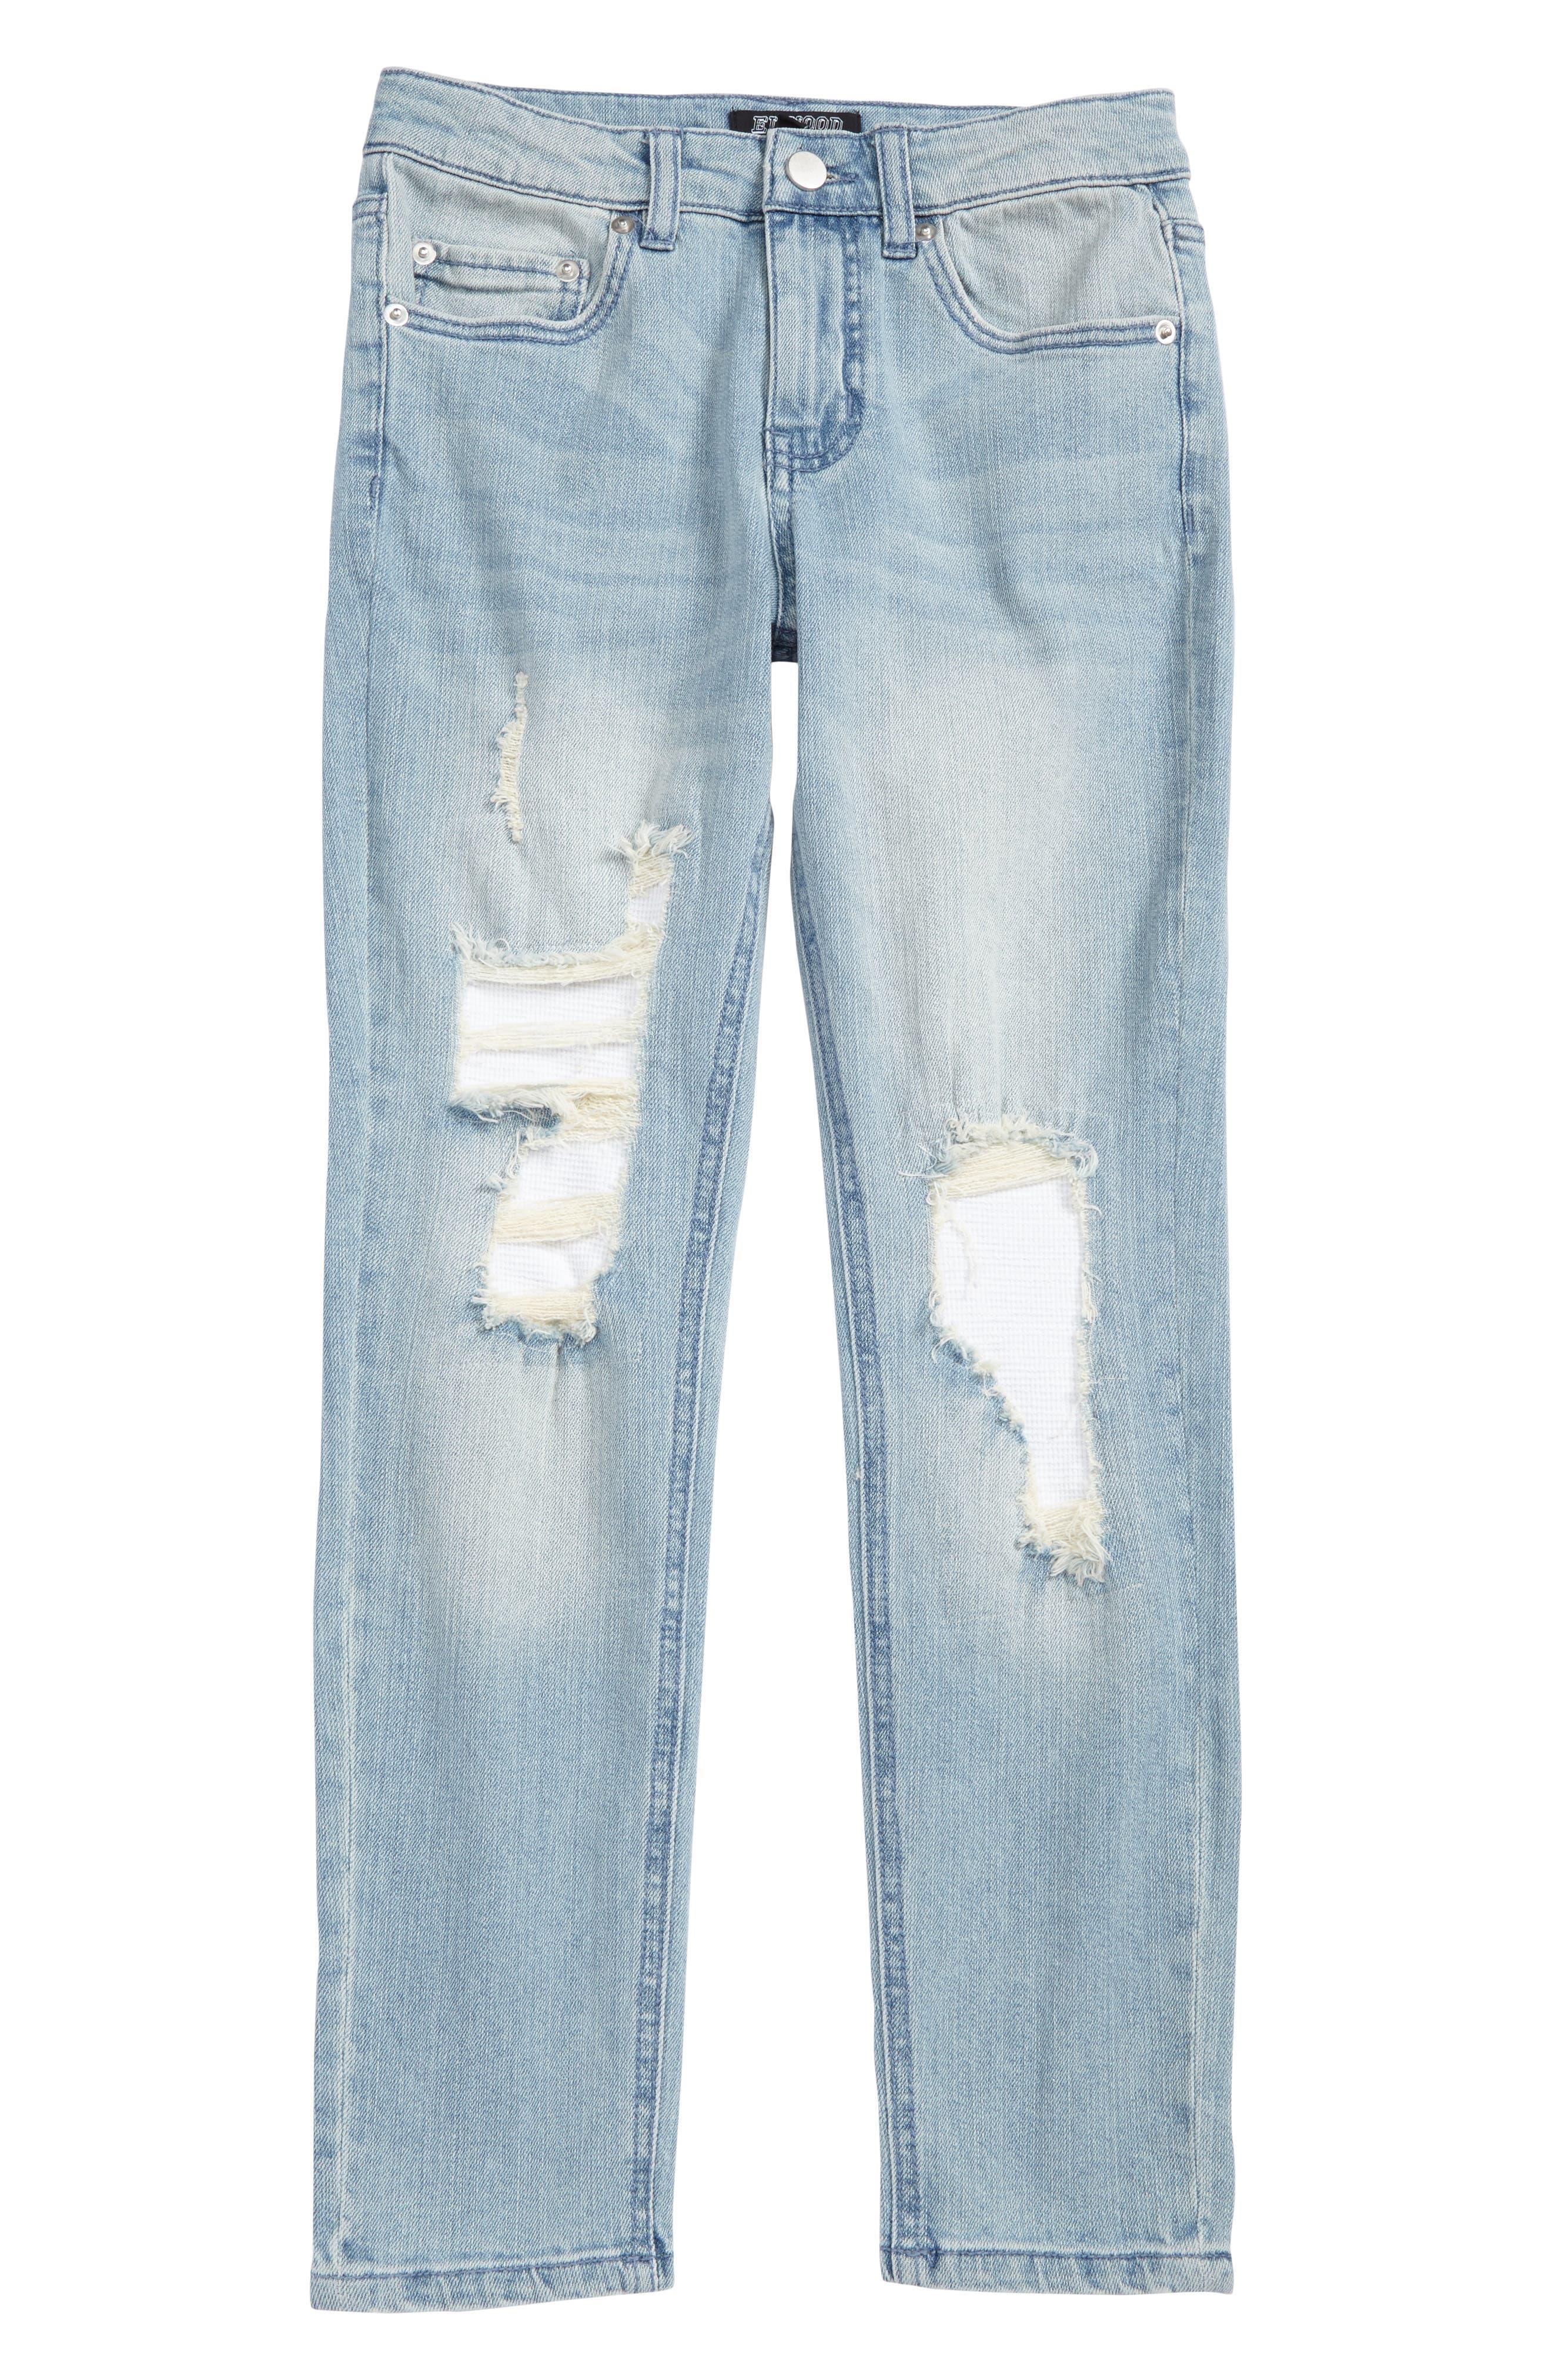 Alternate Image 1 Selected - Elwood Rip & Repair Straight Leg Jeans (Big Boys)